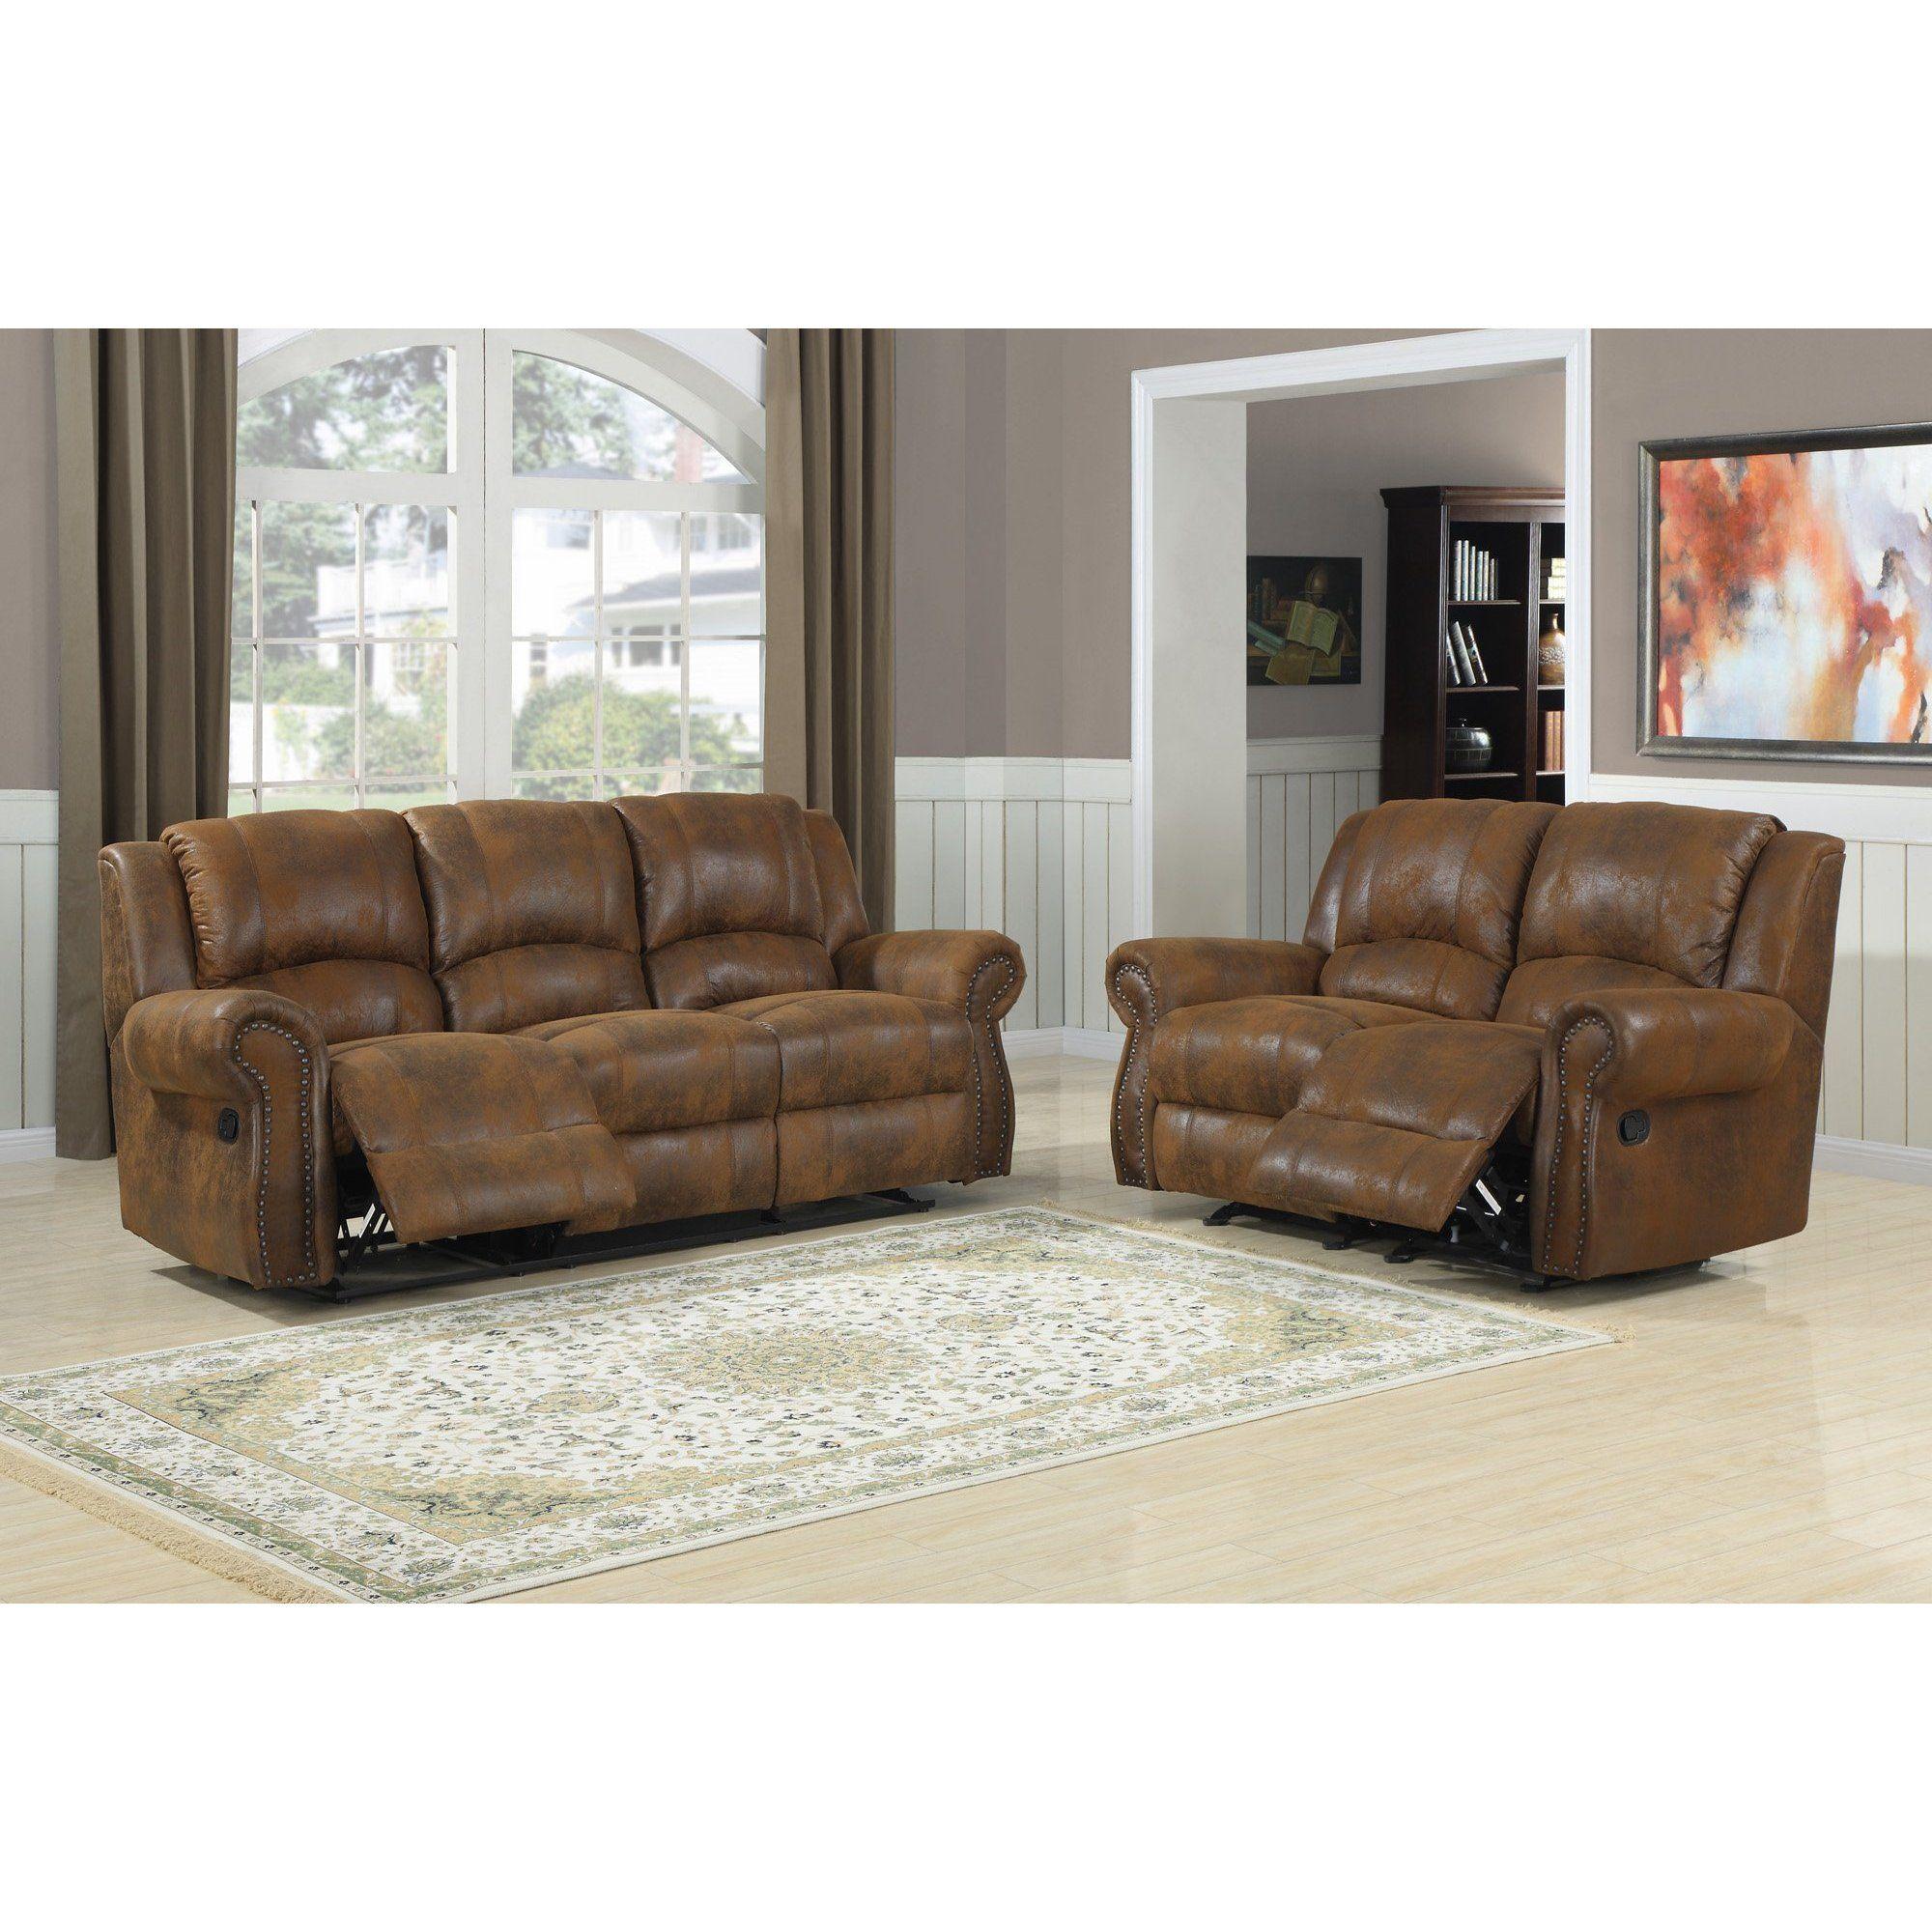 Home Decor Sofa Set: FurnitureMaxx Quinn Double Reclining Sofa , Bomber Jacket